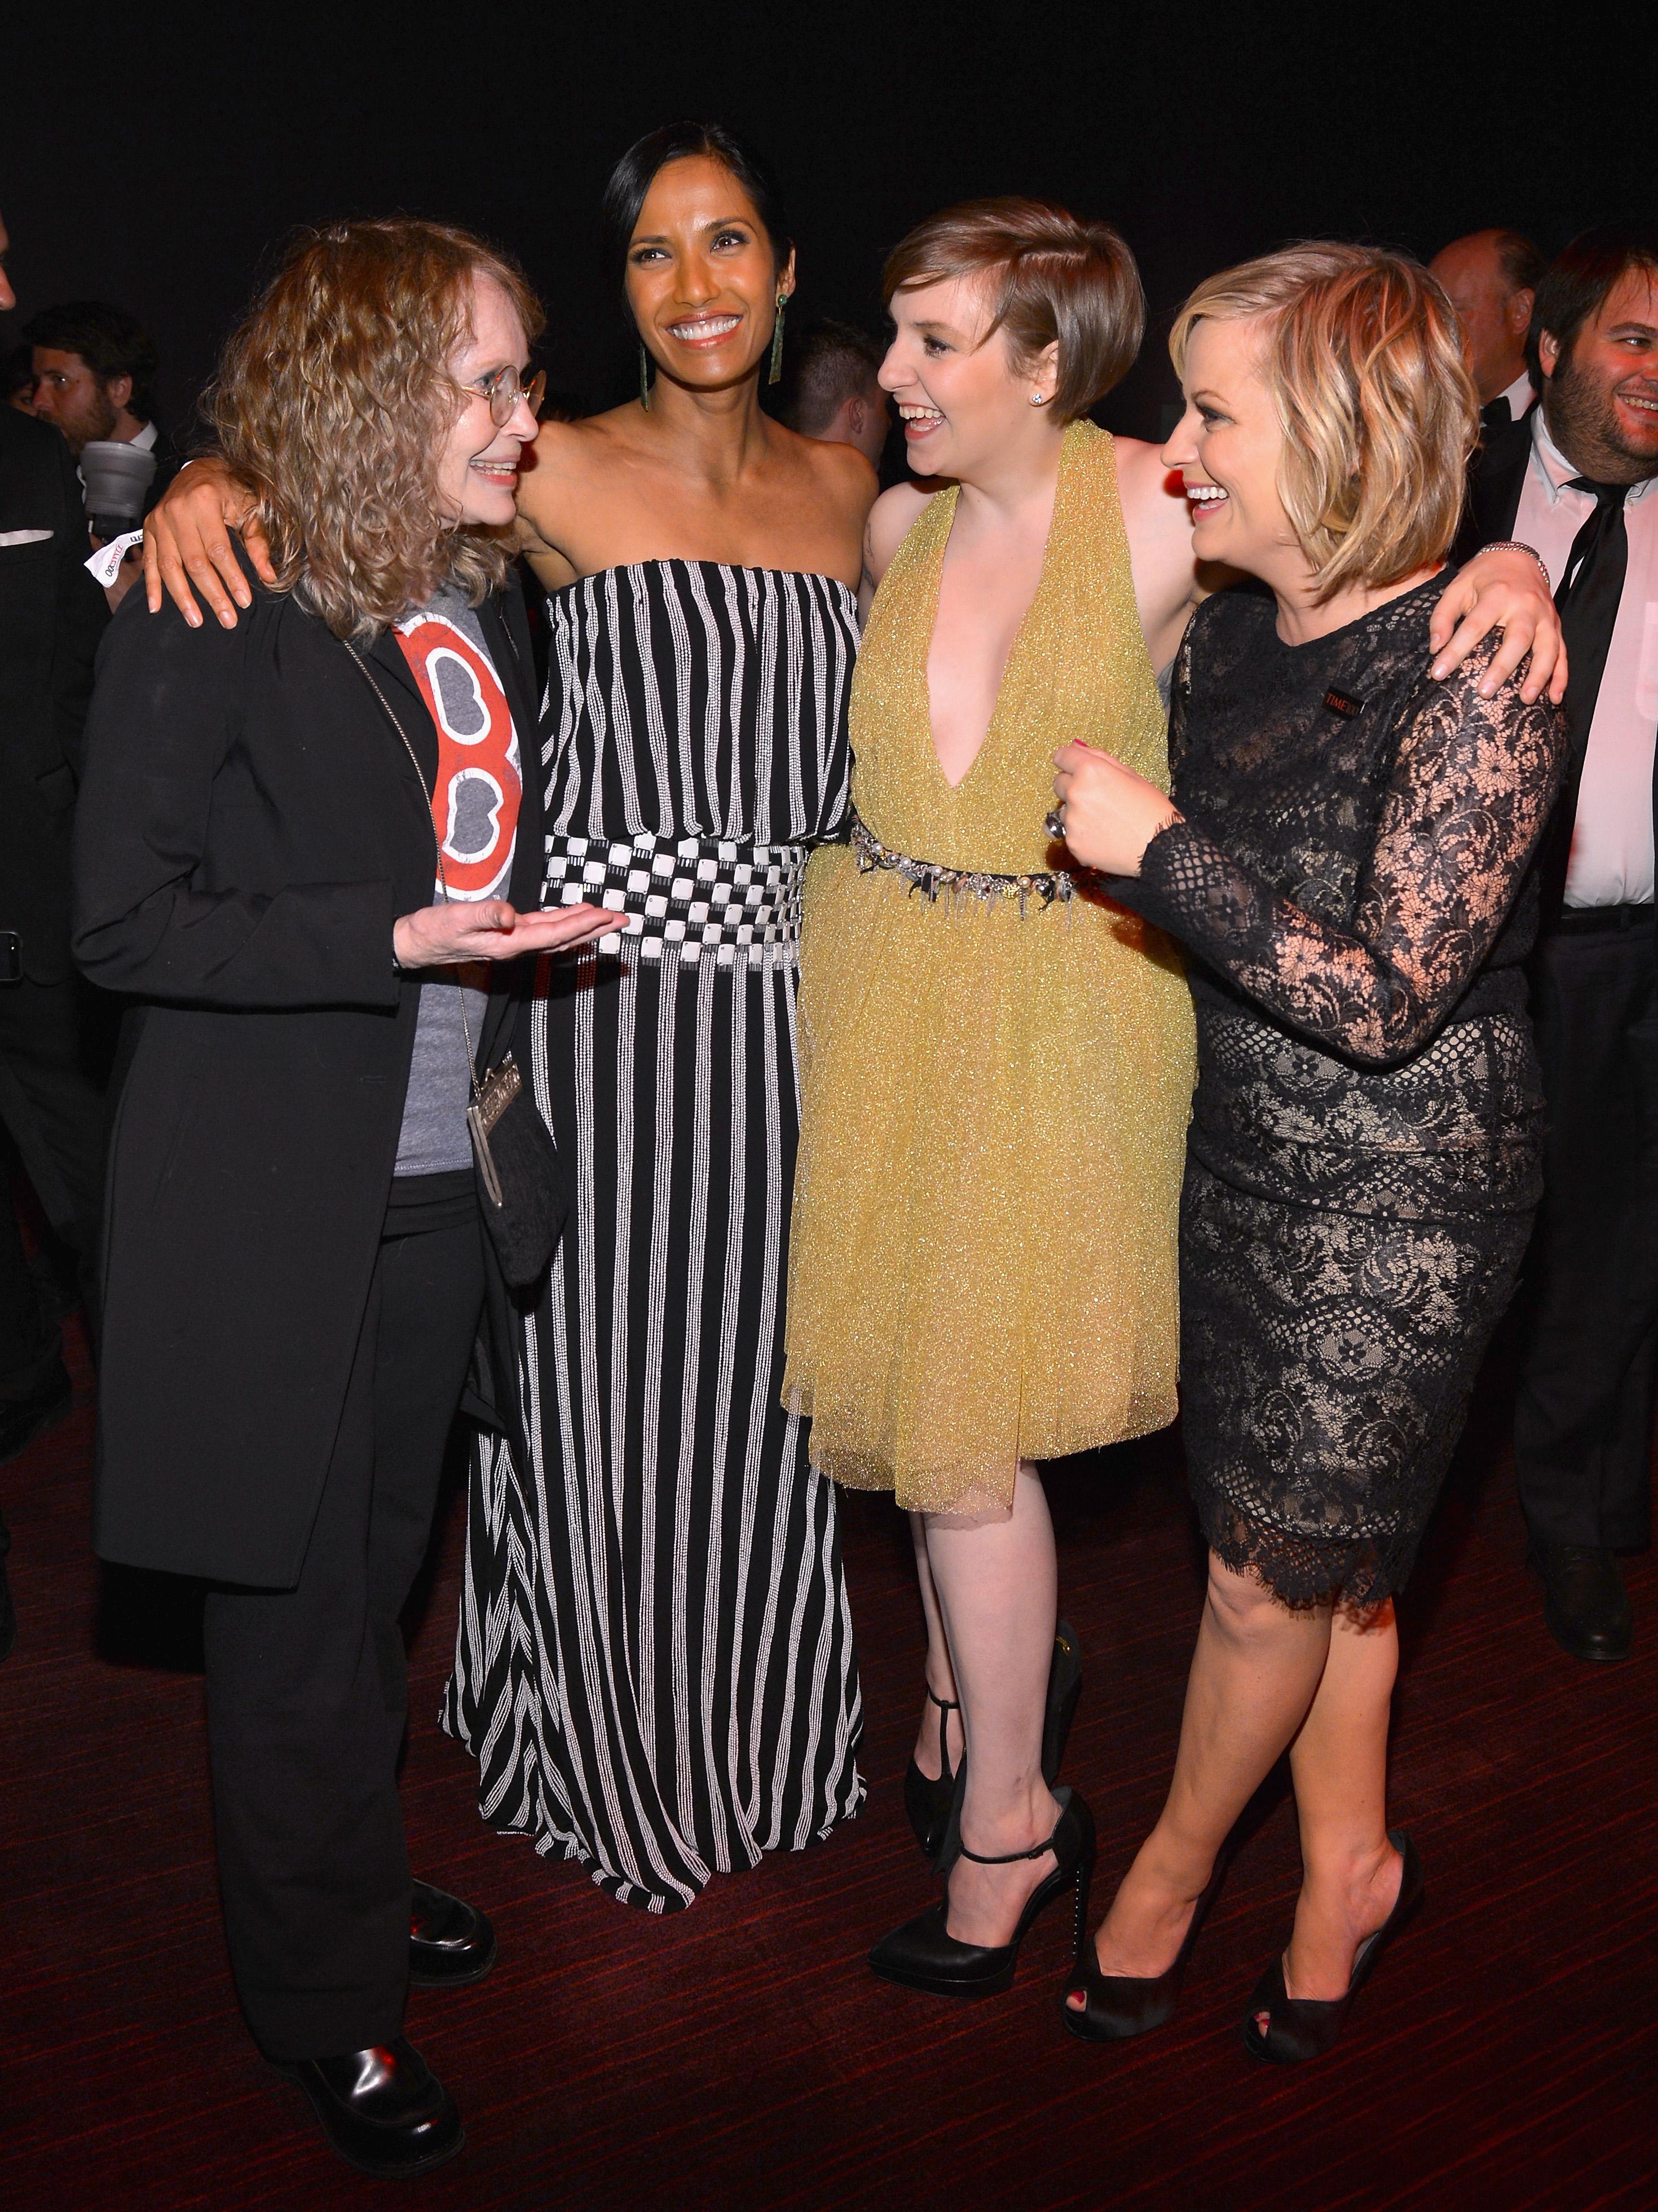 Mia Farrow, Padma Lakshmi, Lena Dunham & Amy Poehler